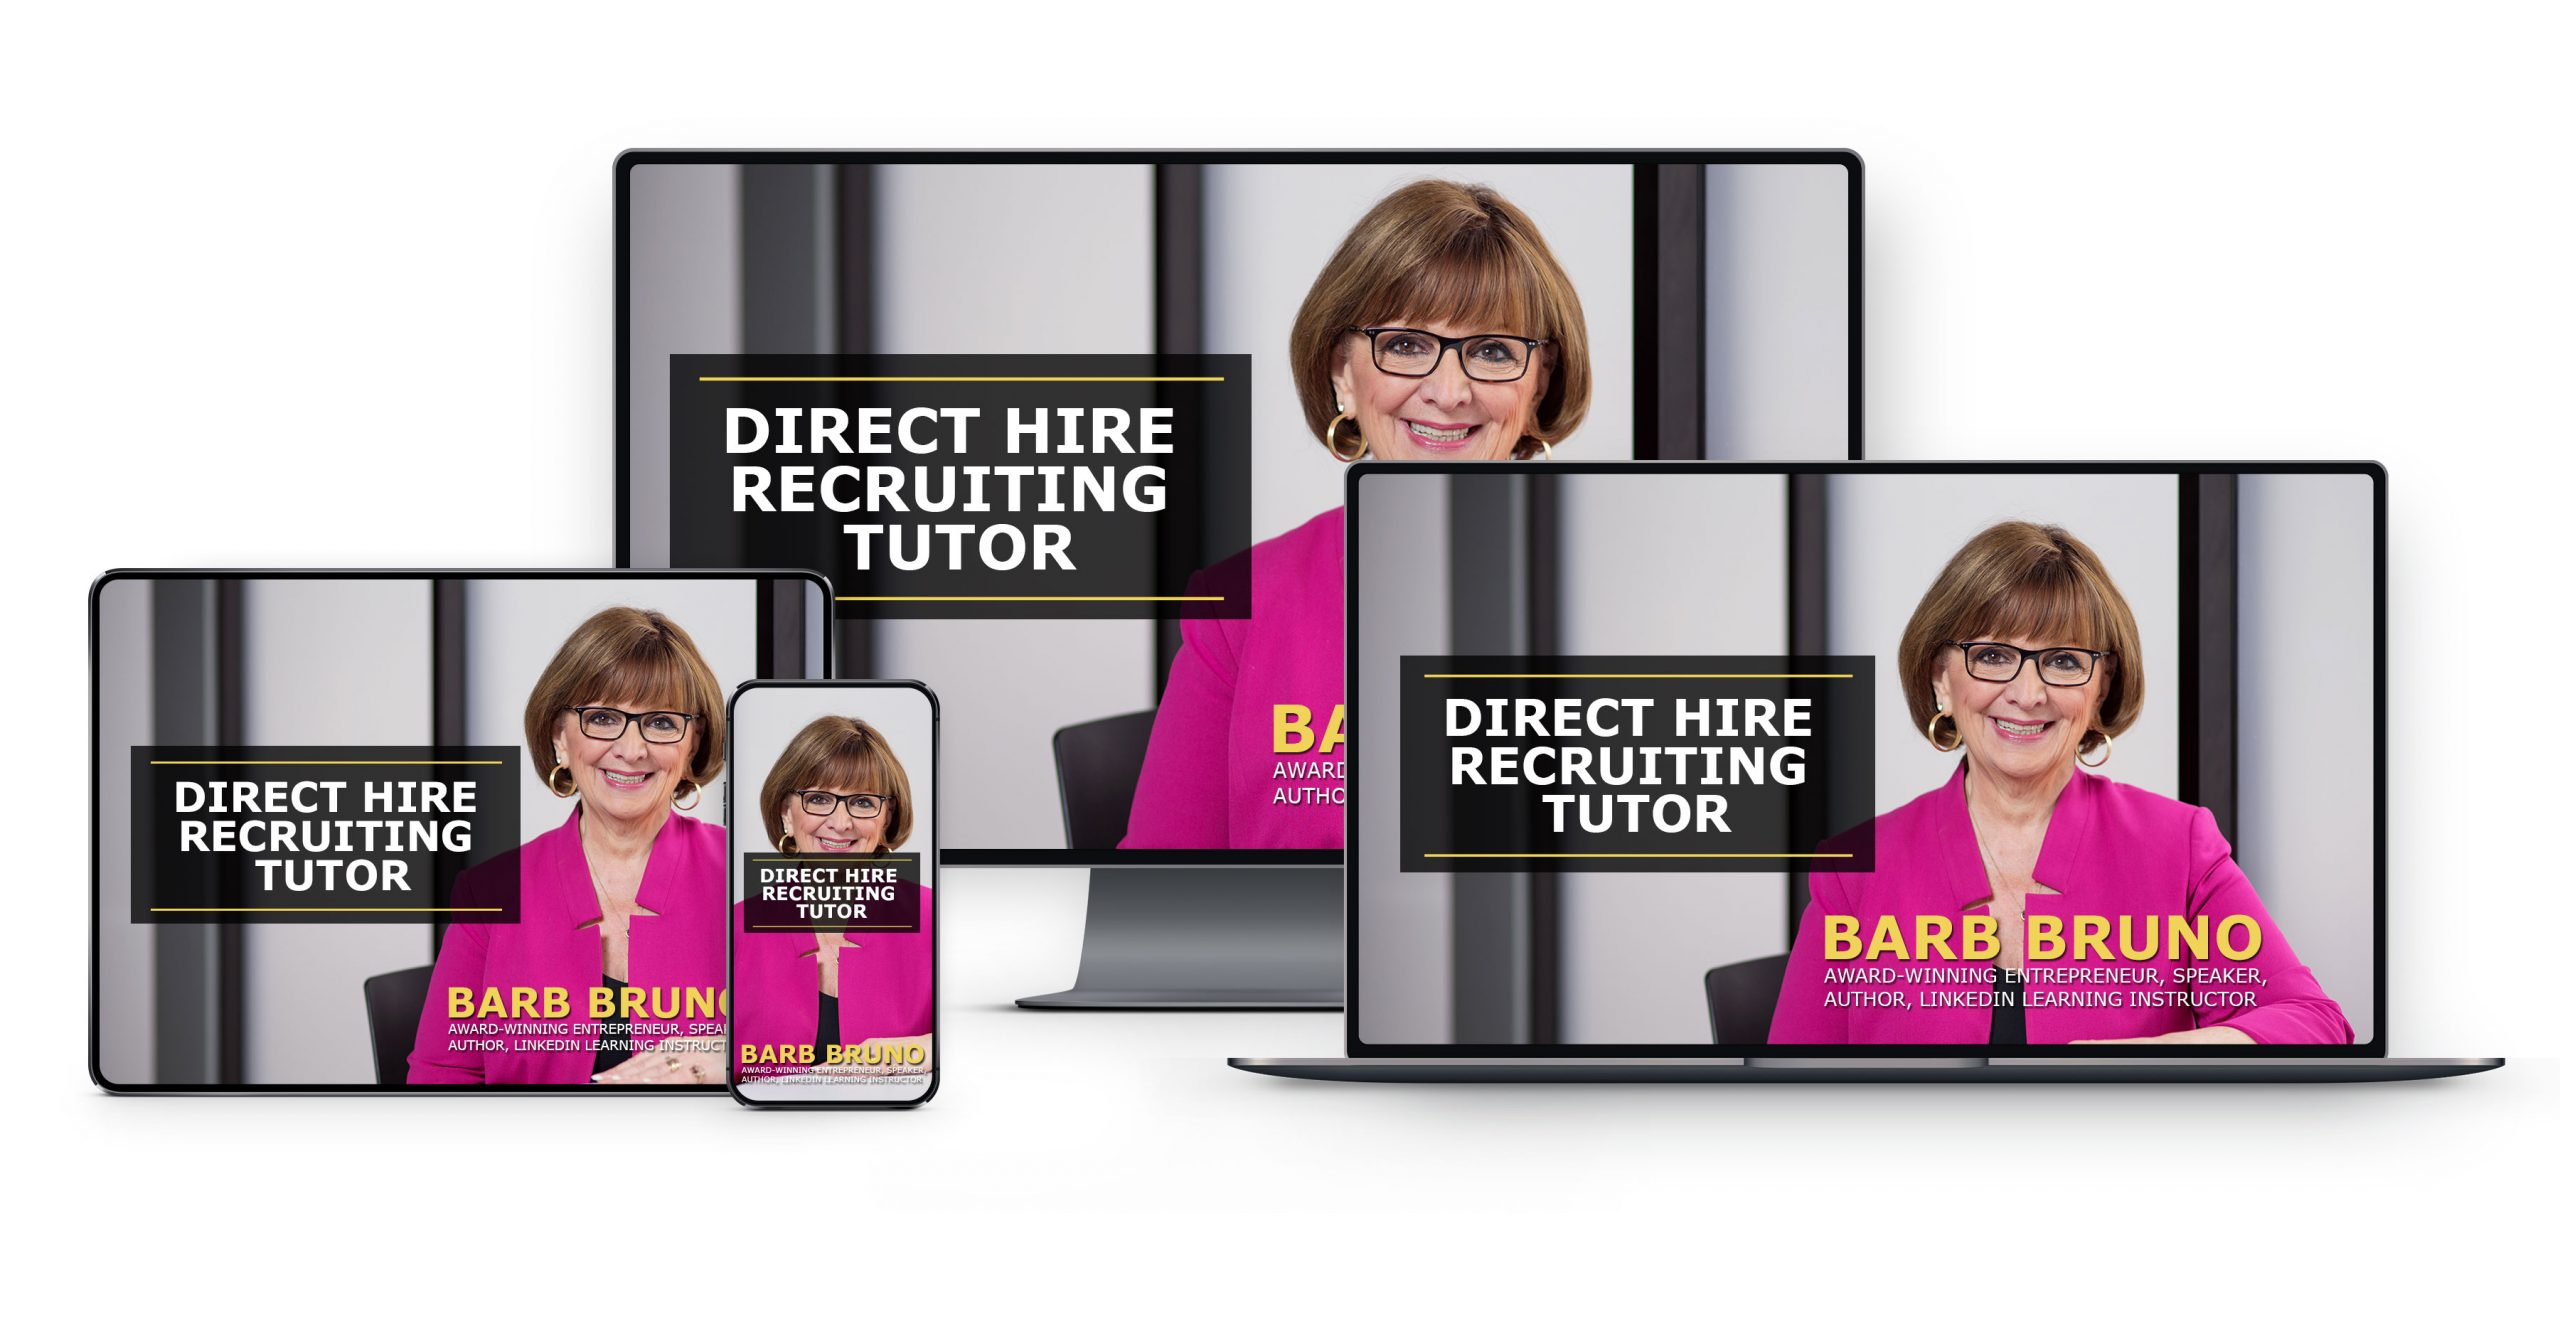 direct--hire-recruiting-tutor